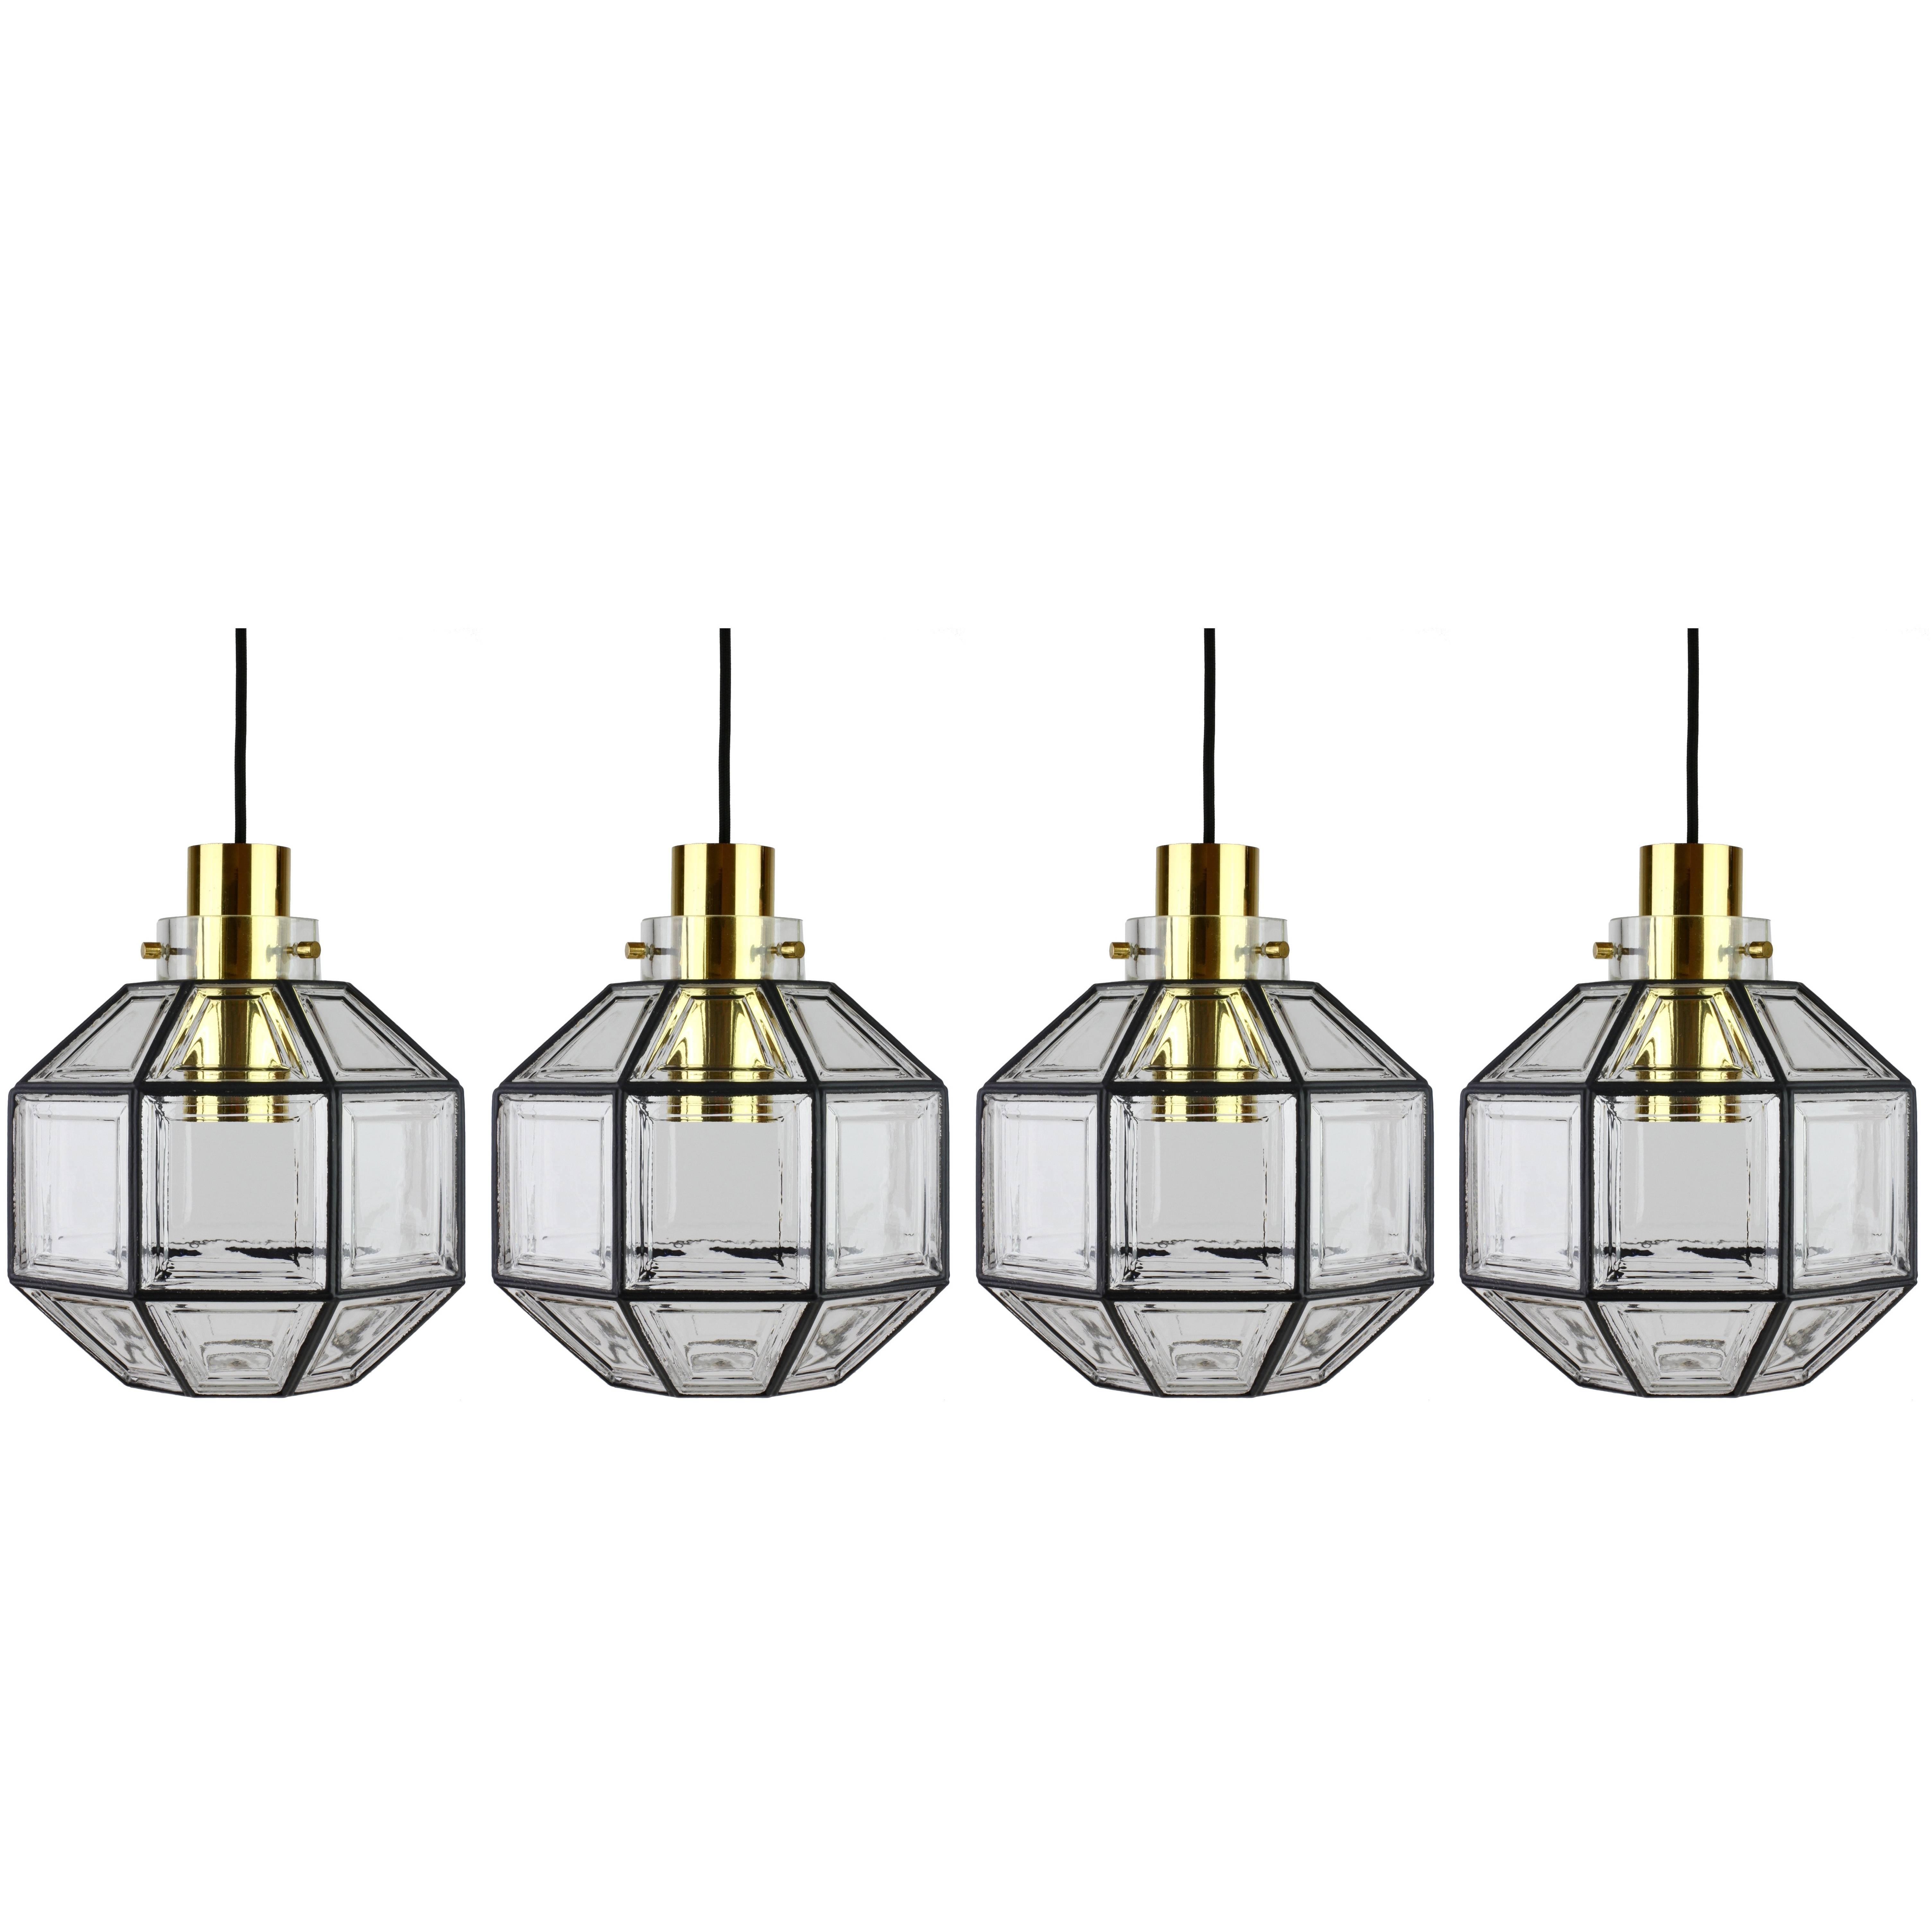 Four Large Minimalist Iron & Glass Pendant Lights by Glashütte Limburg 1960s